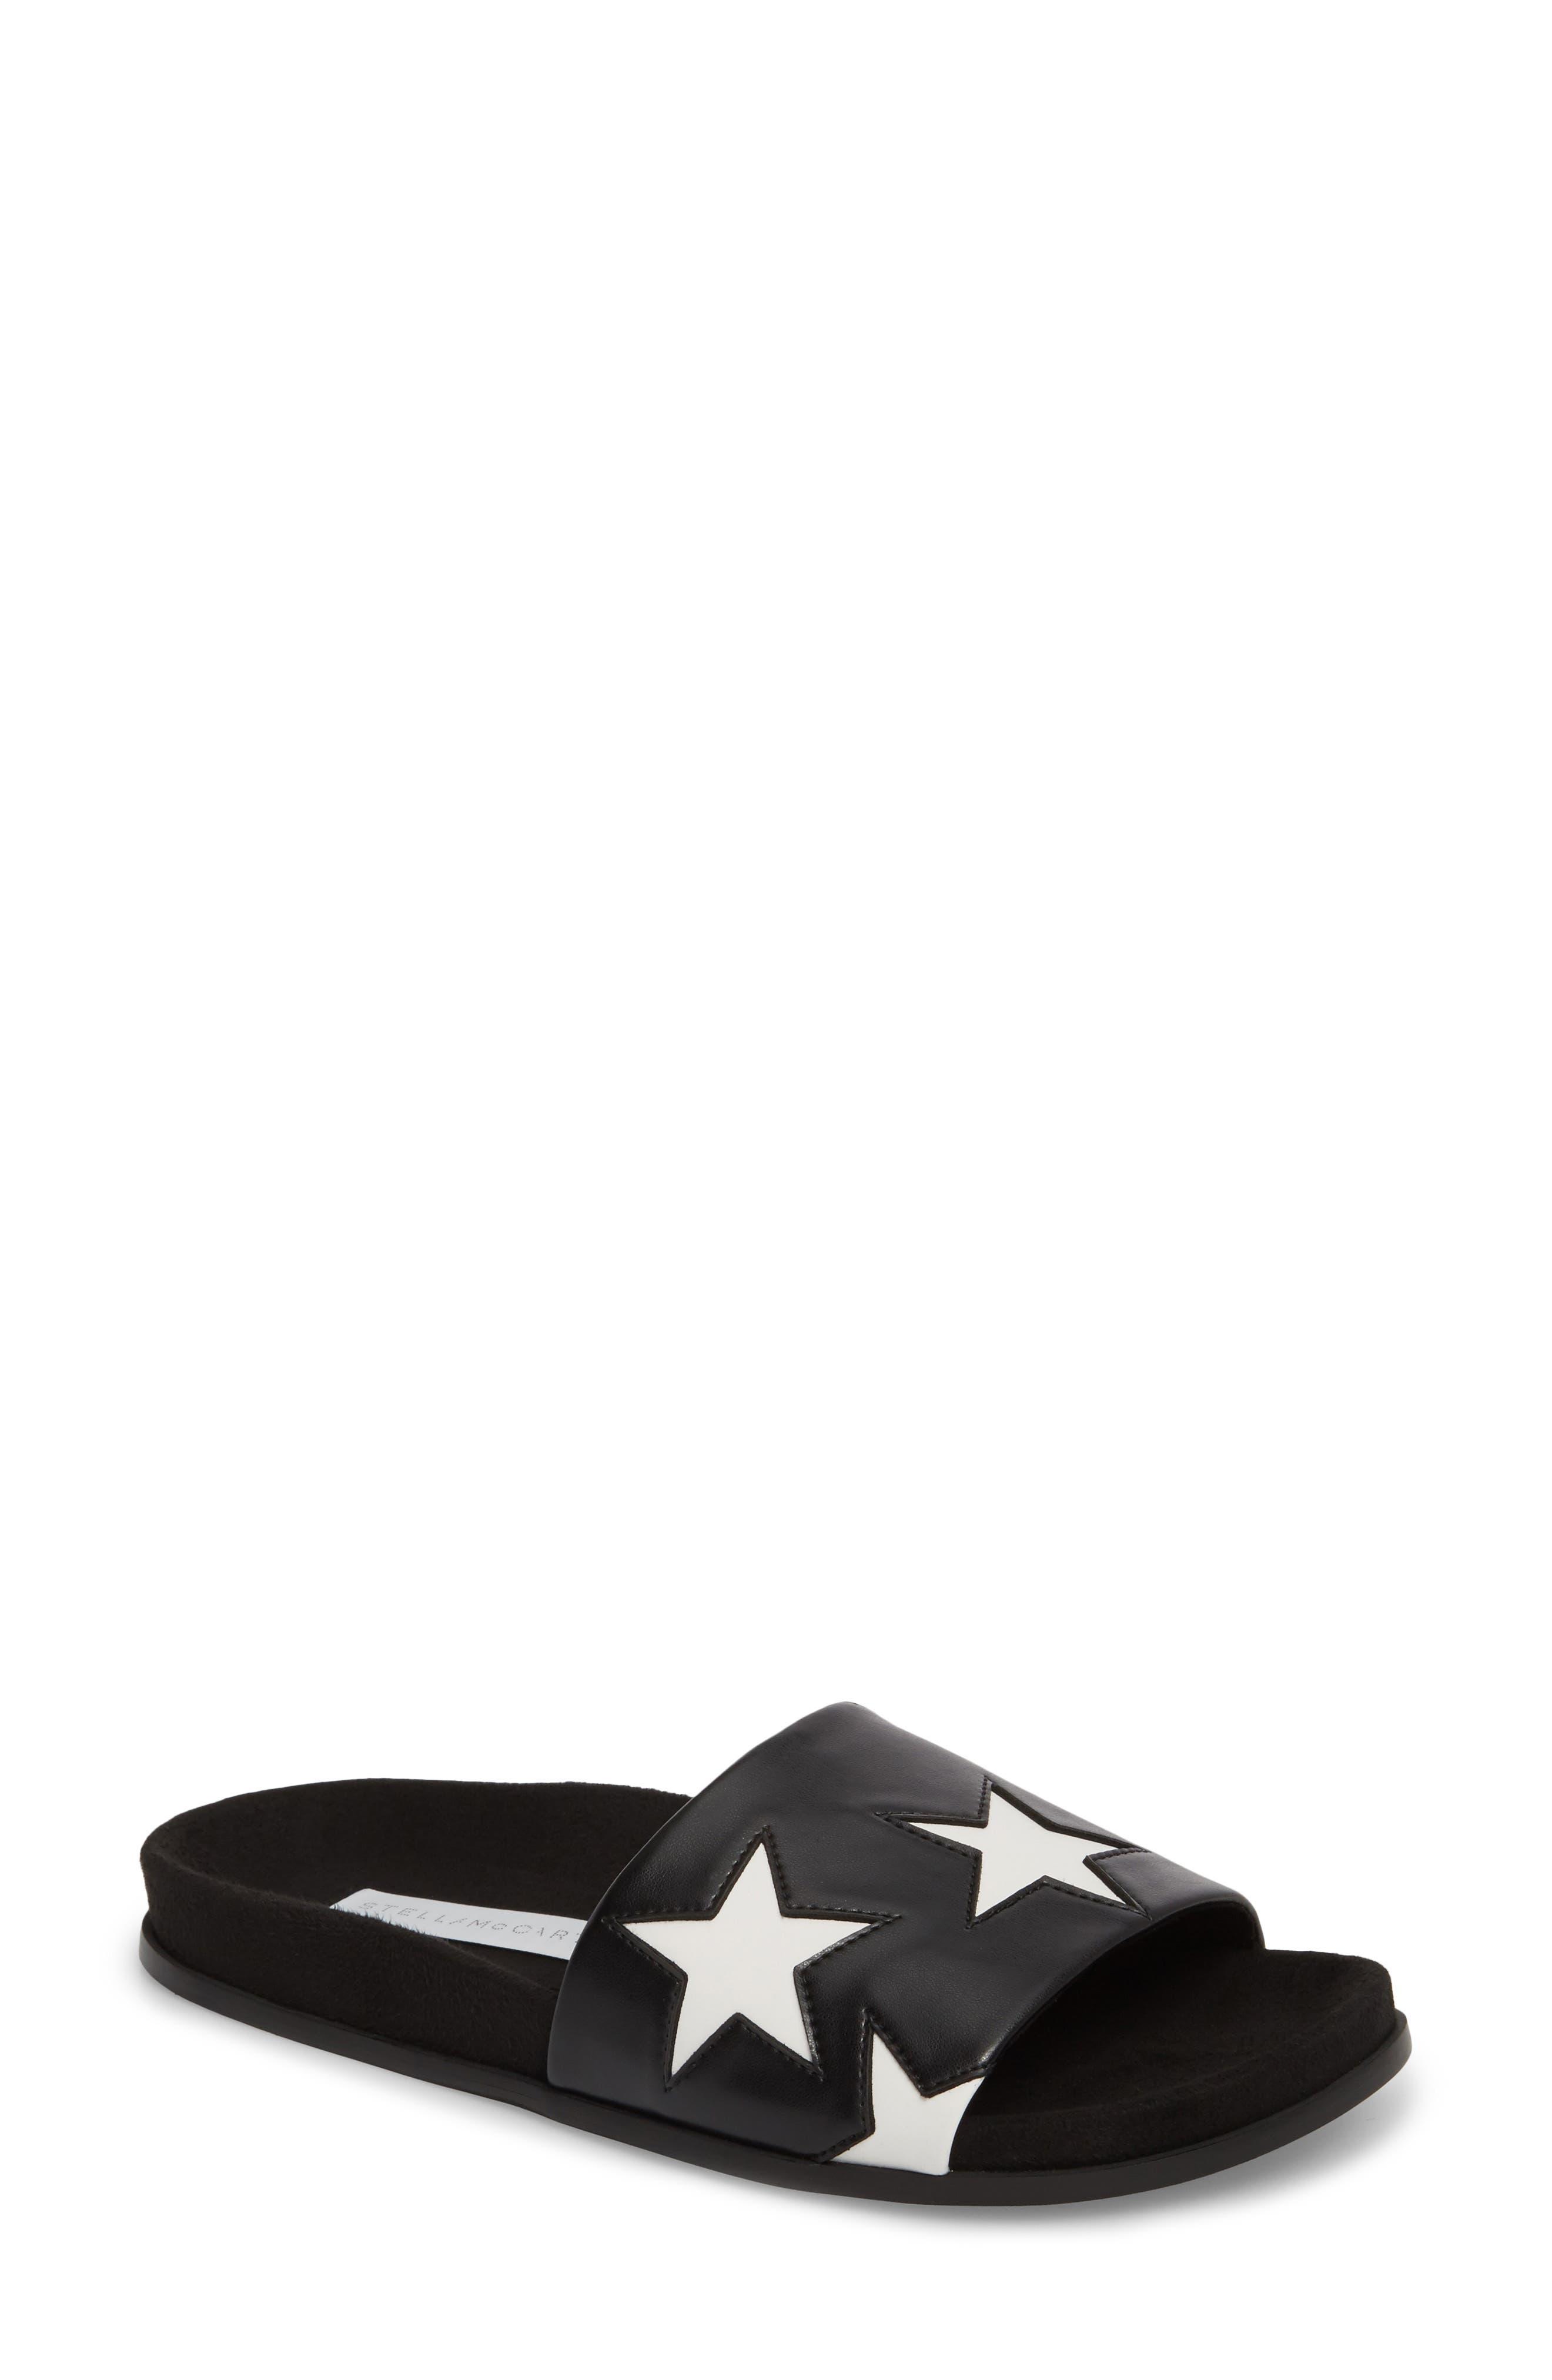 Star Slide Sandal,                         Main,                         color, 001